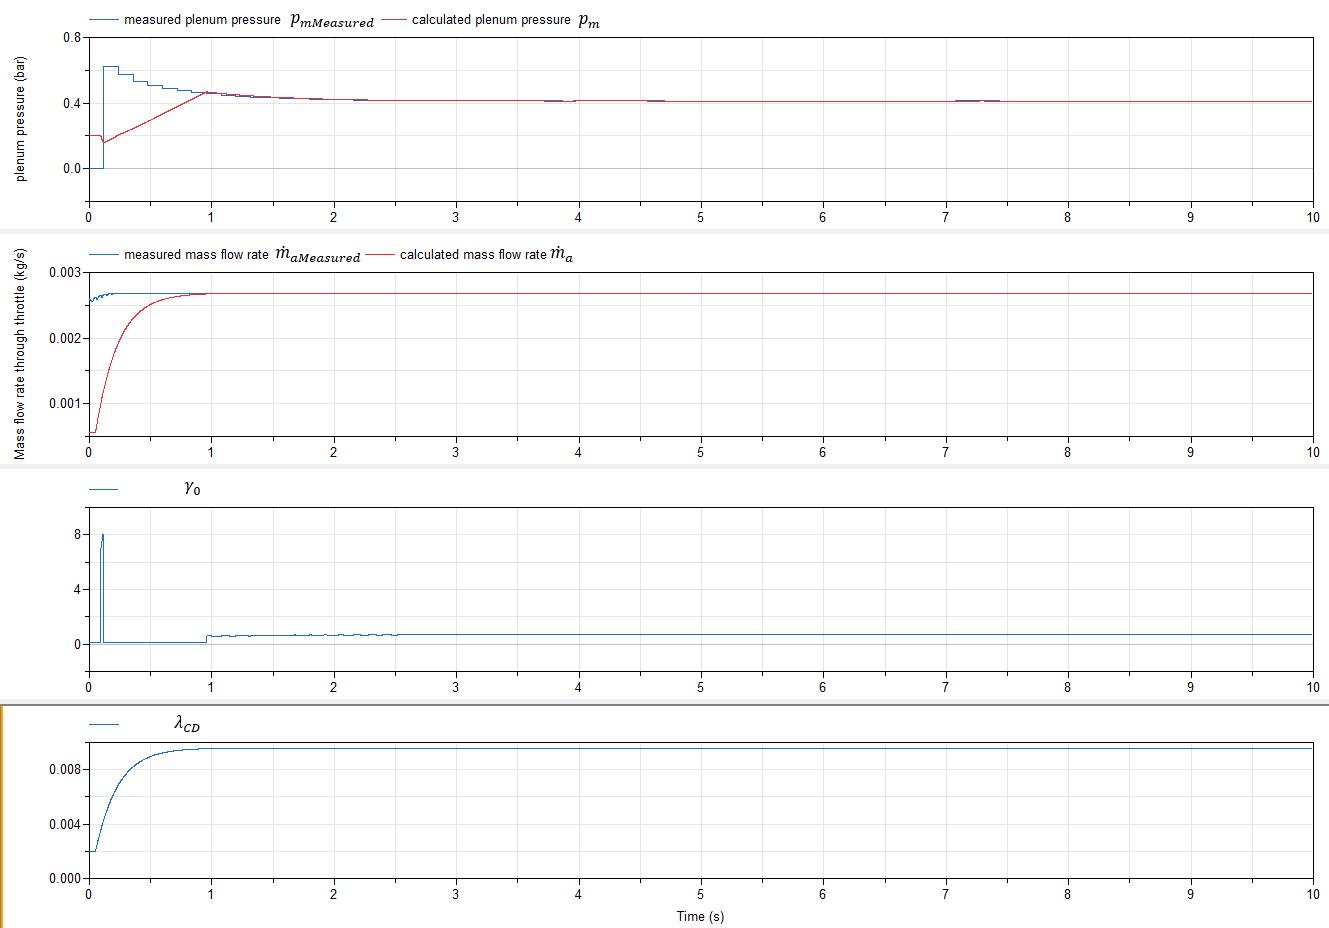 subplot 1: calculated and measured manifold pressures; subplot 2: calculated and measured throttle mass flow rates; subplot 3: γ0; subplot 4: λCD